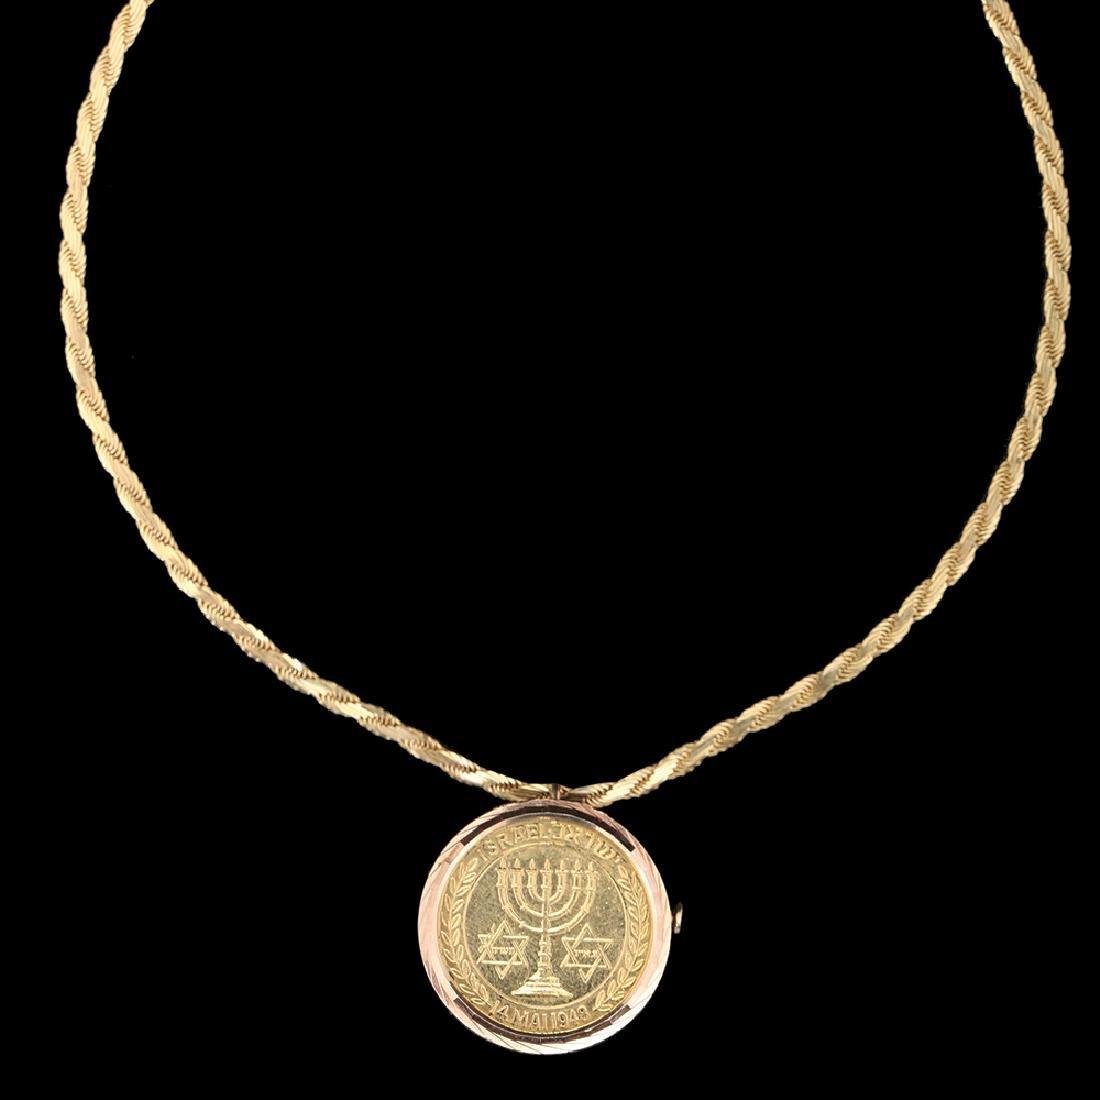 An 18K GOLD, 900 GOLD COIN PENTANT/BROOCH